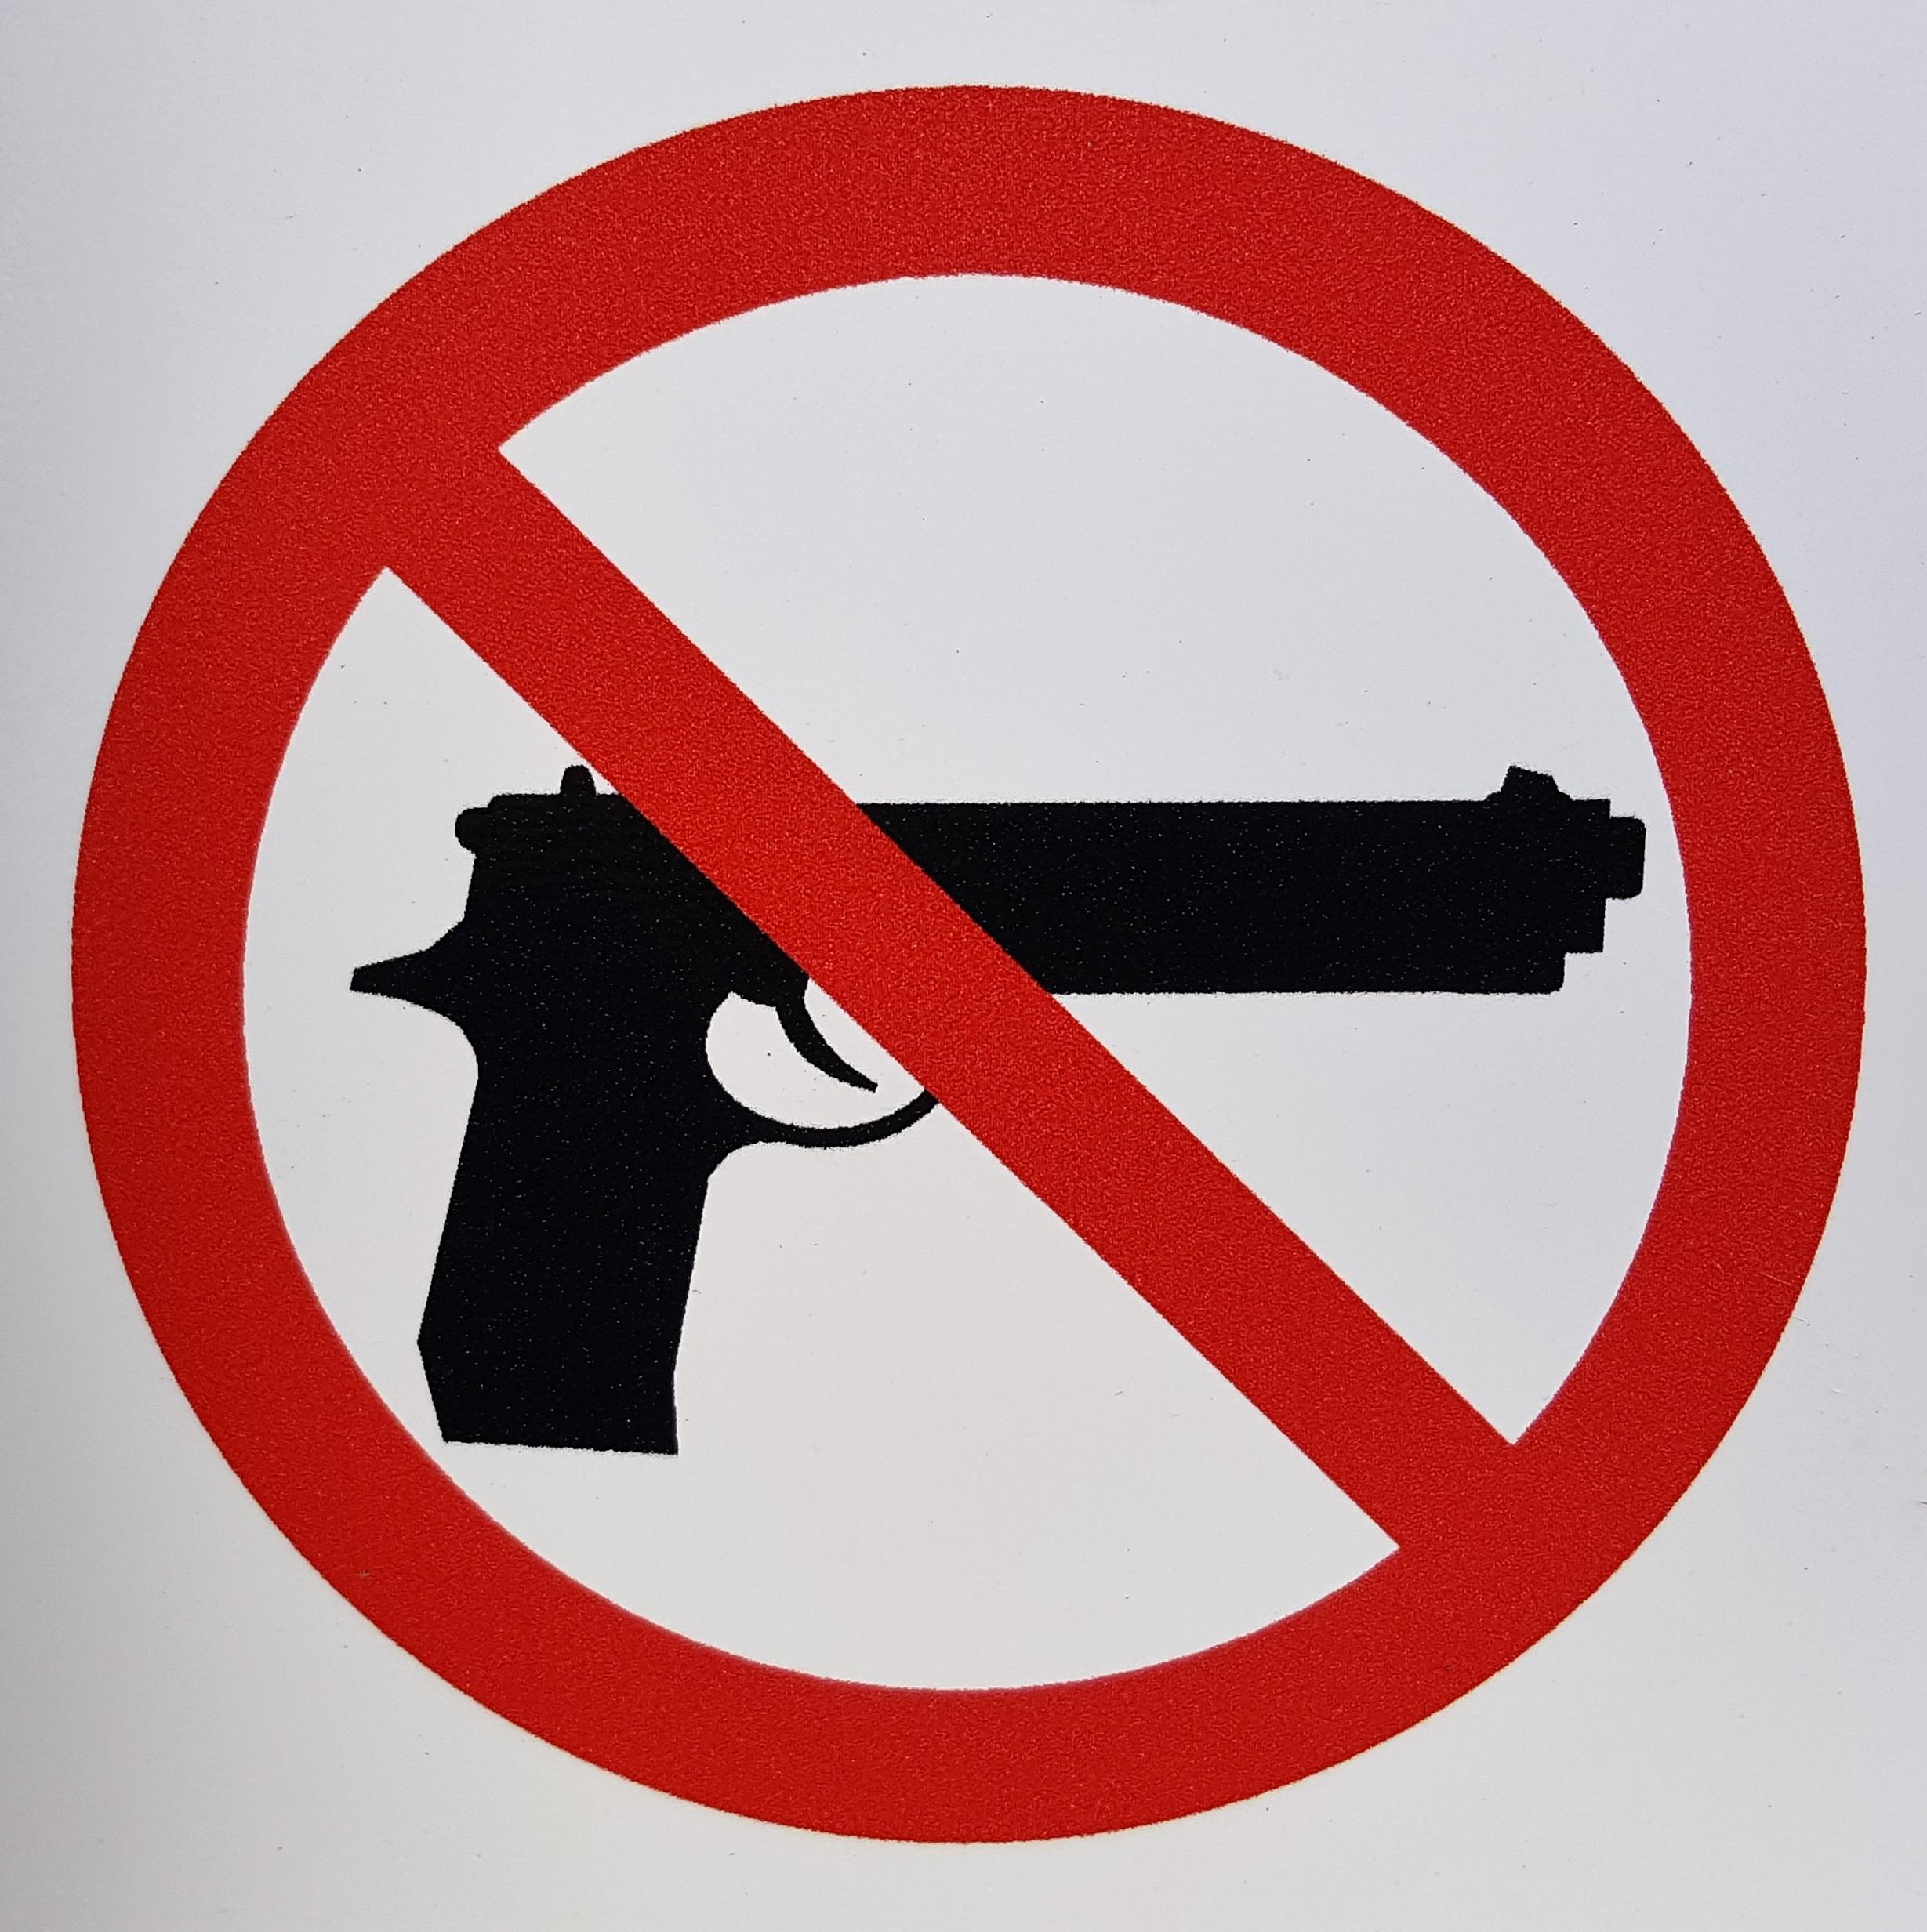 Essays on gun control debate